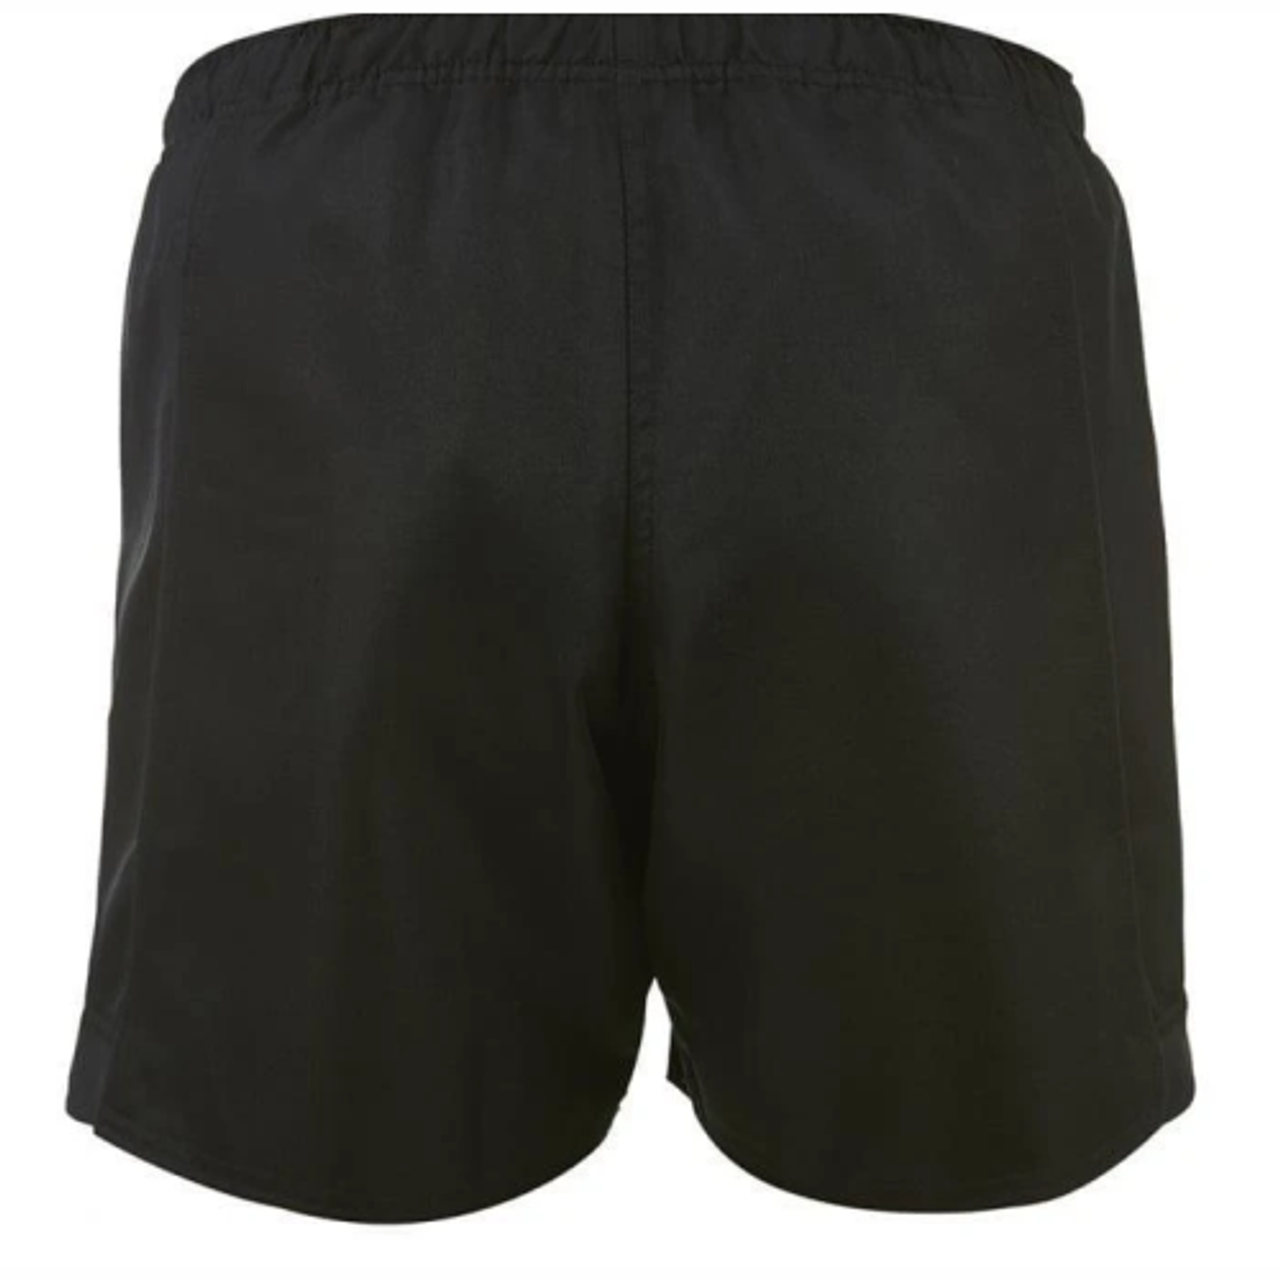 CCC Advantage Shorts, Black